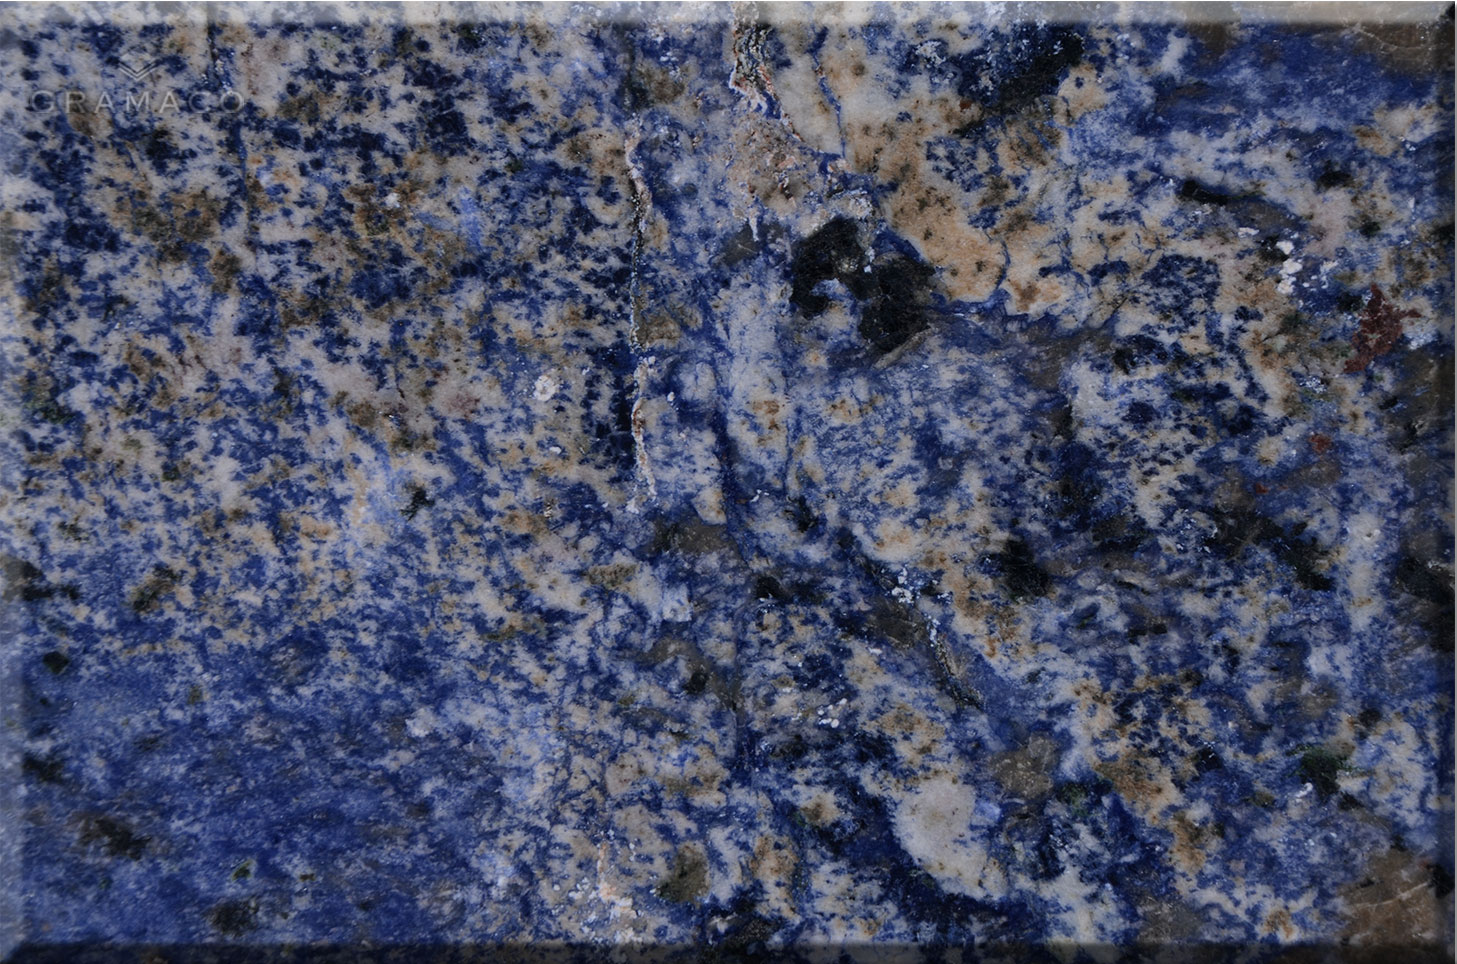 Azul Bahia Bg10032 Gramaco